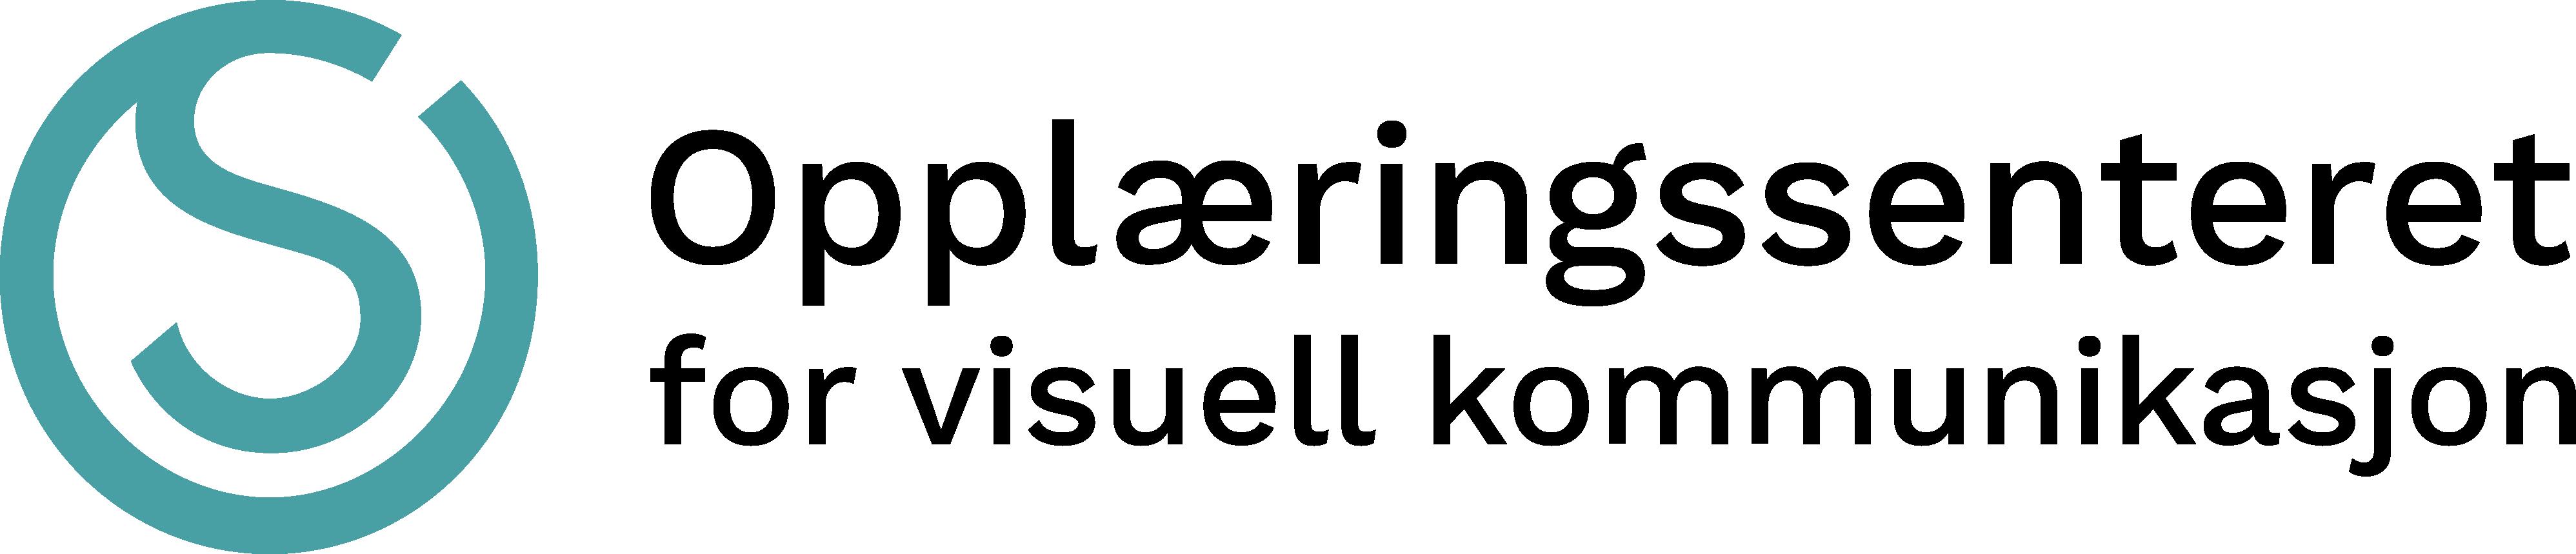 OS-logo-gronn